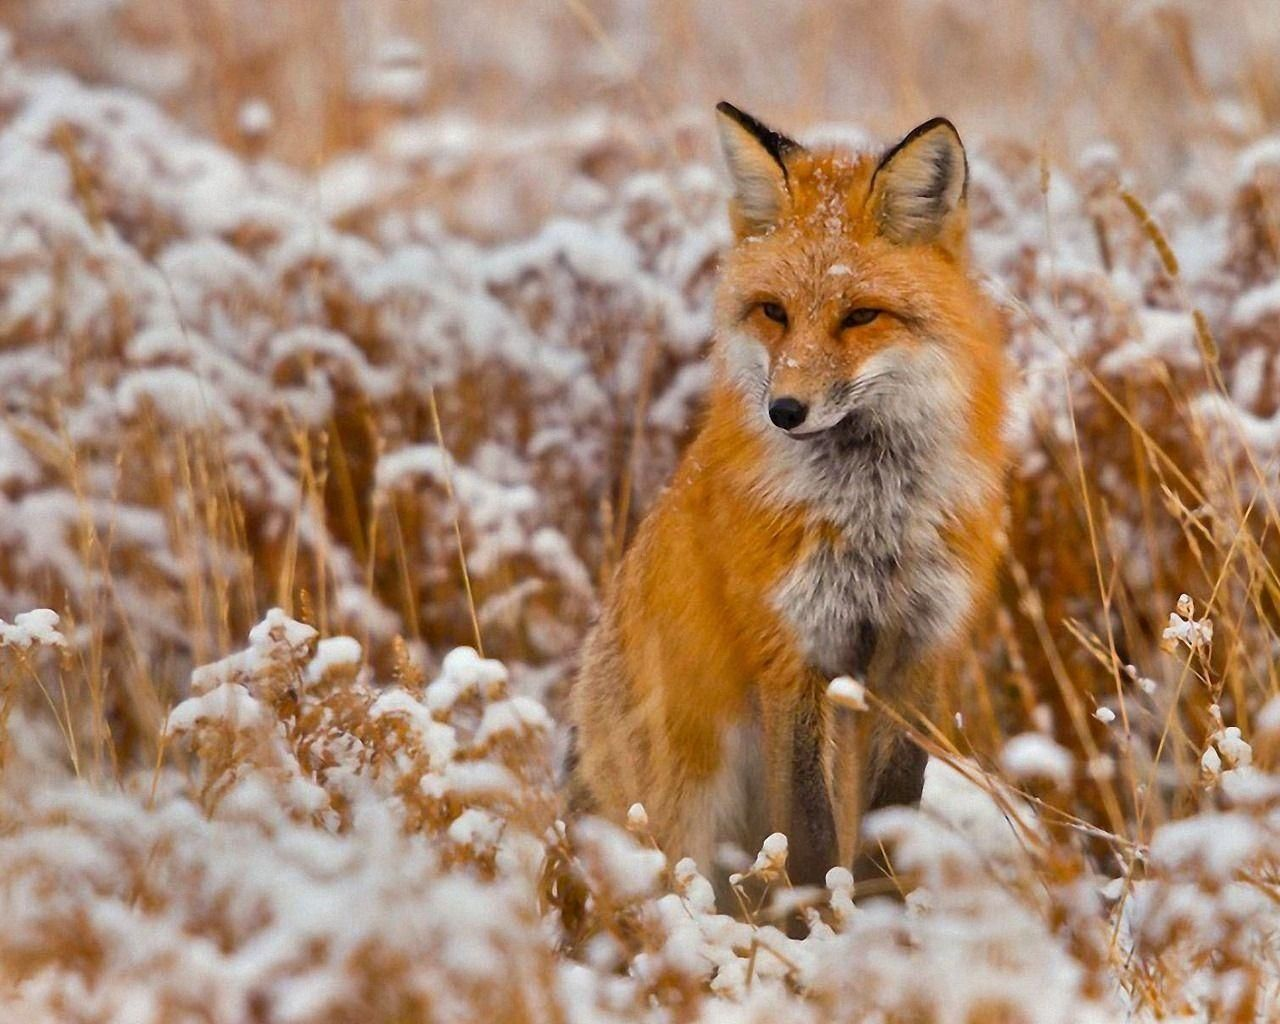 10 Best Red Fox Hd Wallpaper Full Hd 1920 1080 For Pc Desktop Fond D Ecran Renard Renard Roux Renard Animal De Compagnie